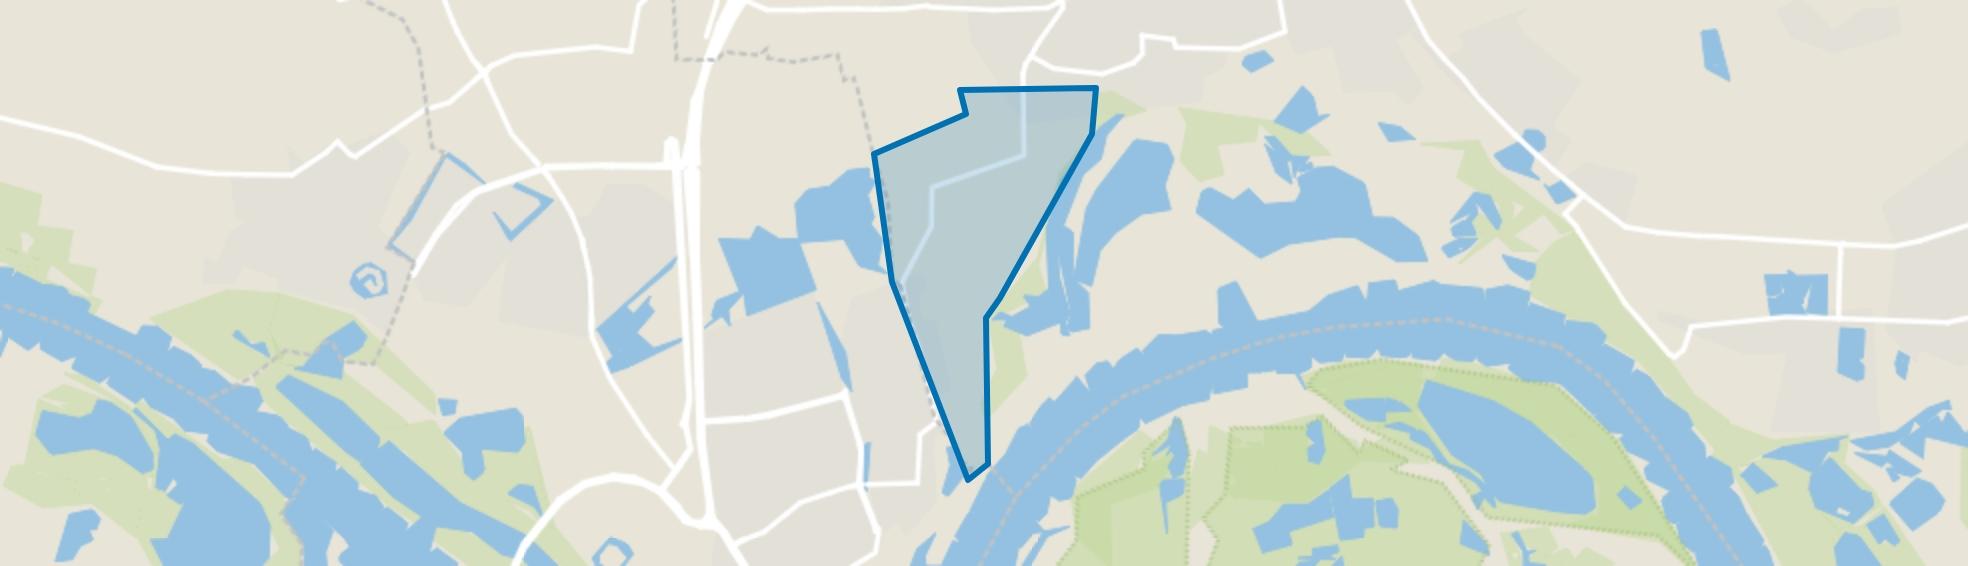 Verspreide huizen Bemmel-Lent, Bemmel map